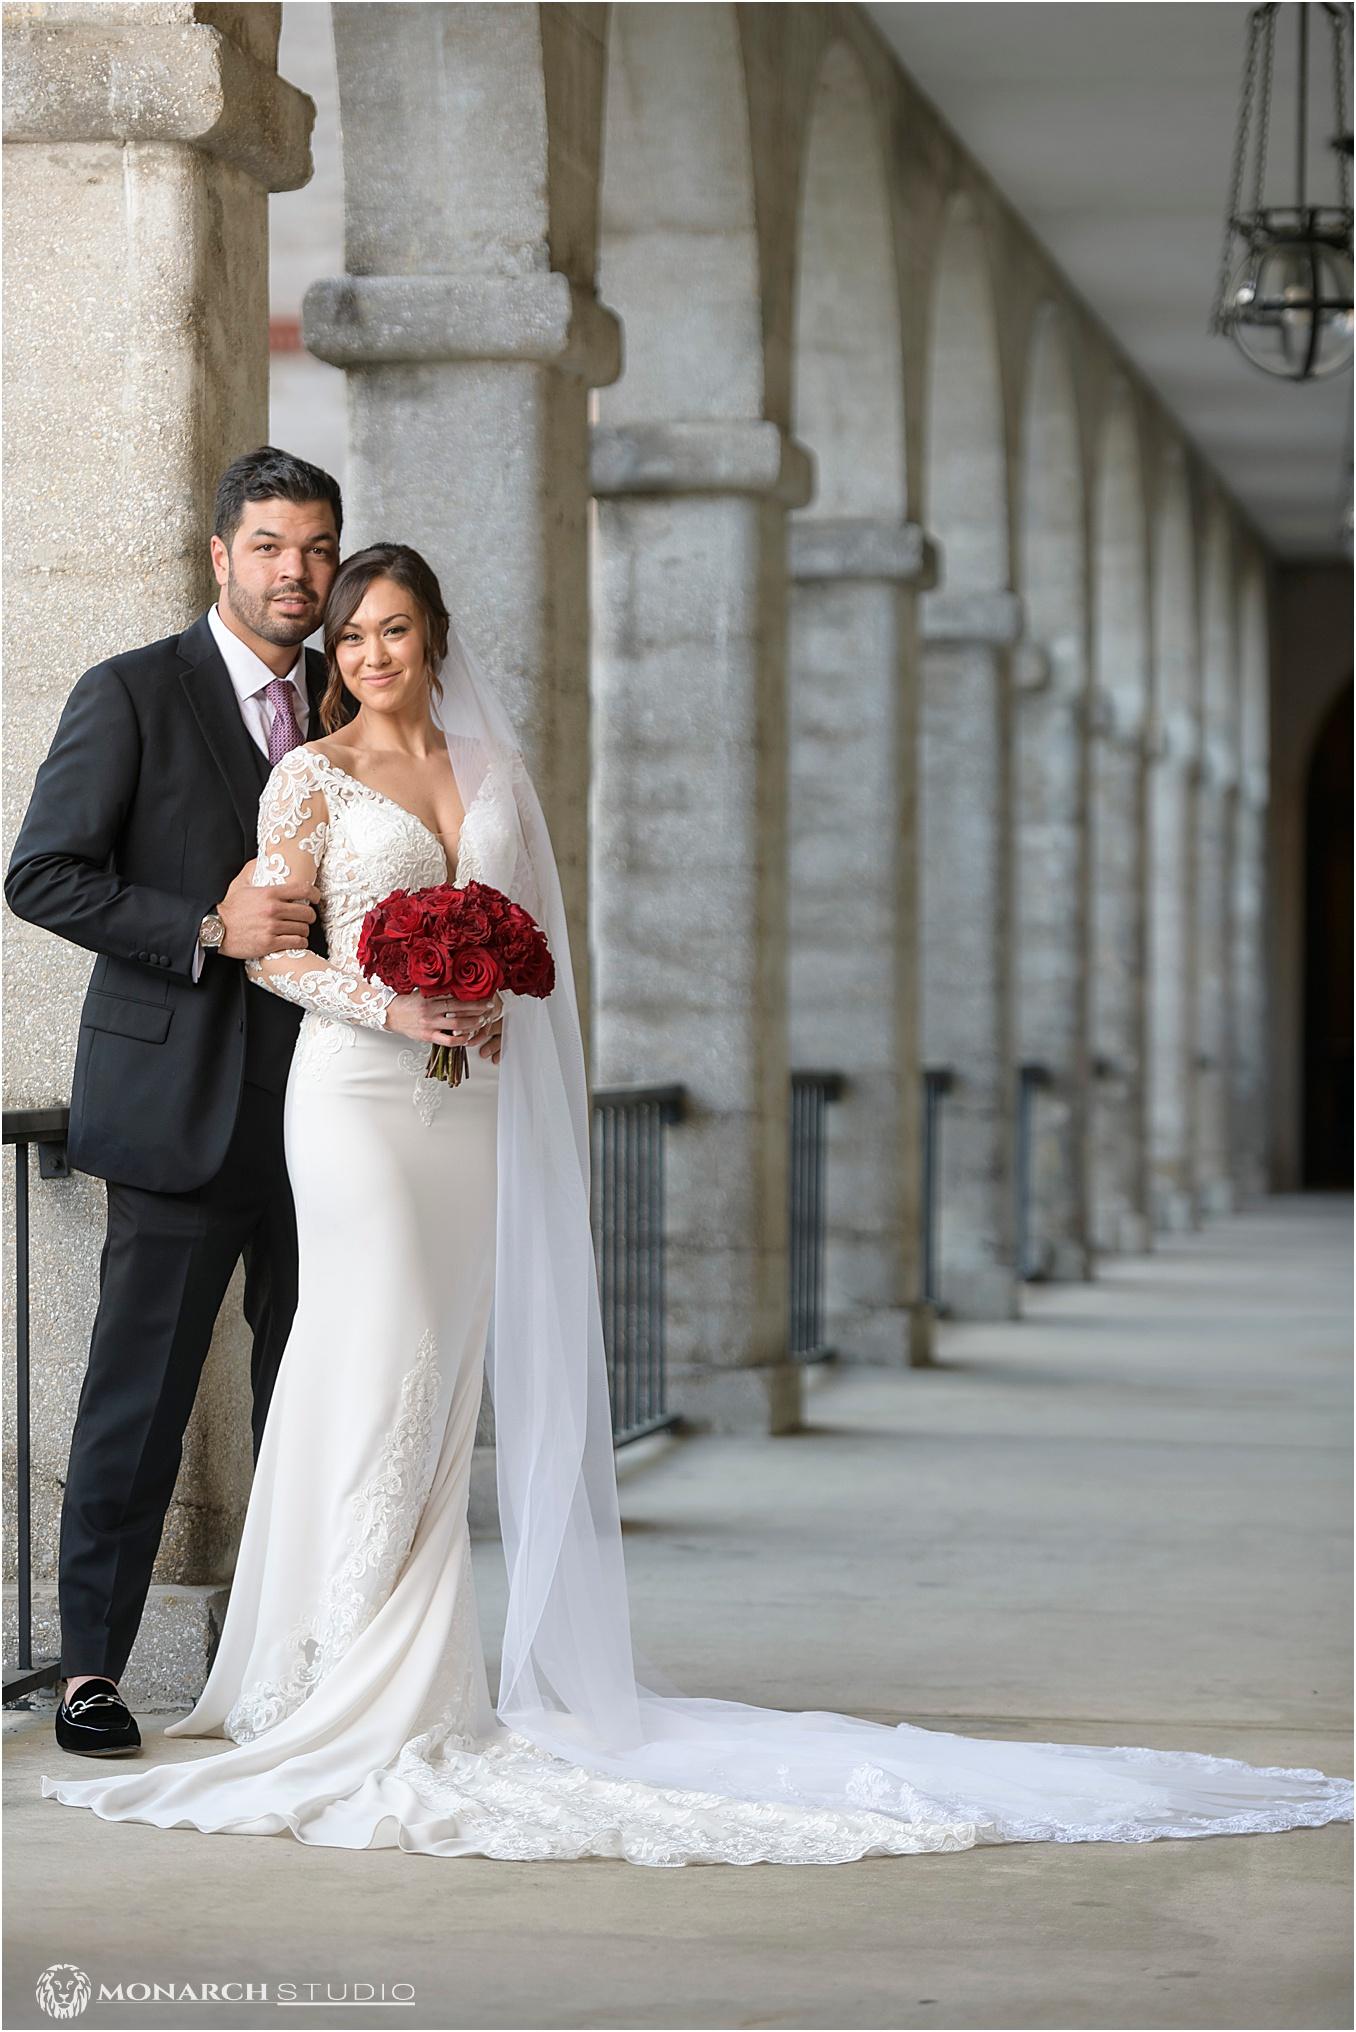 st-augustine-high-end-wedding-photographers-090.jpg